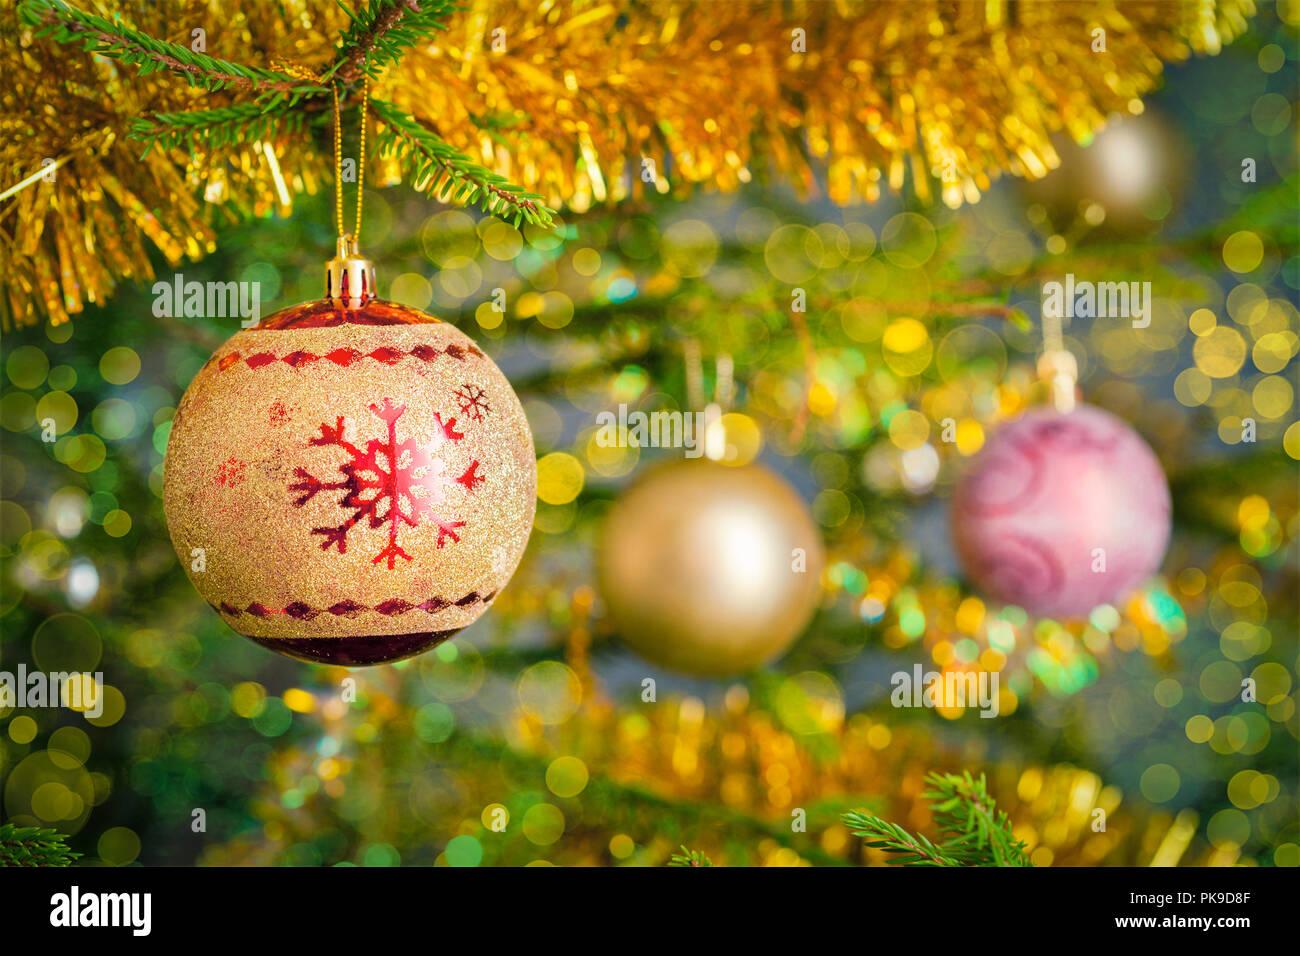 Christmas-tree decoration bauble on decorated Christmas tree bac - Stock Image